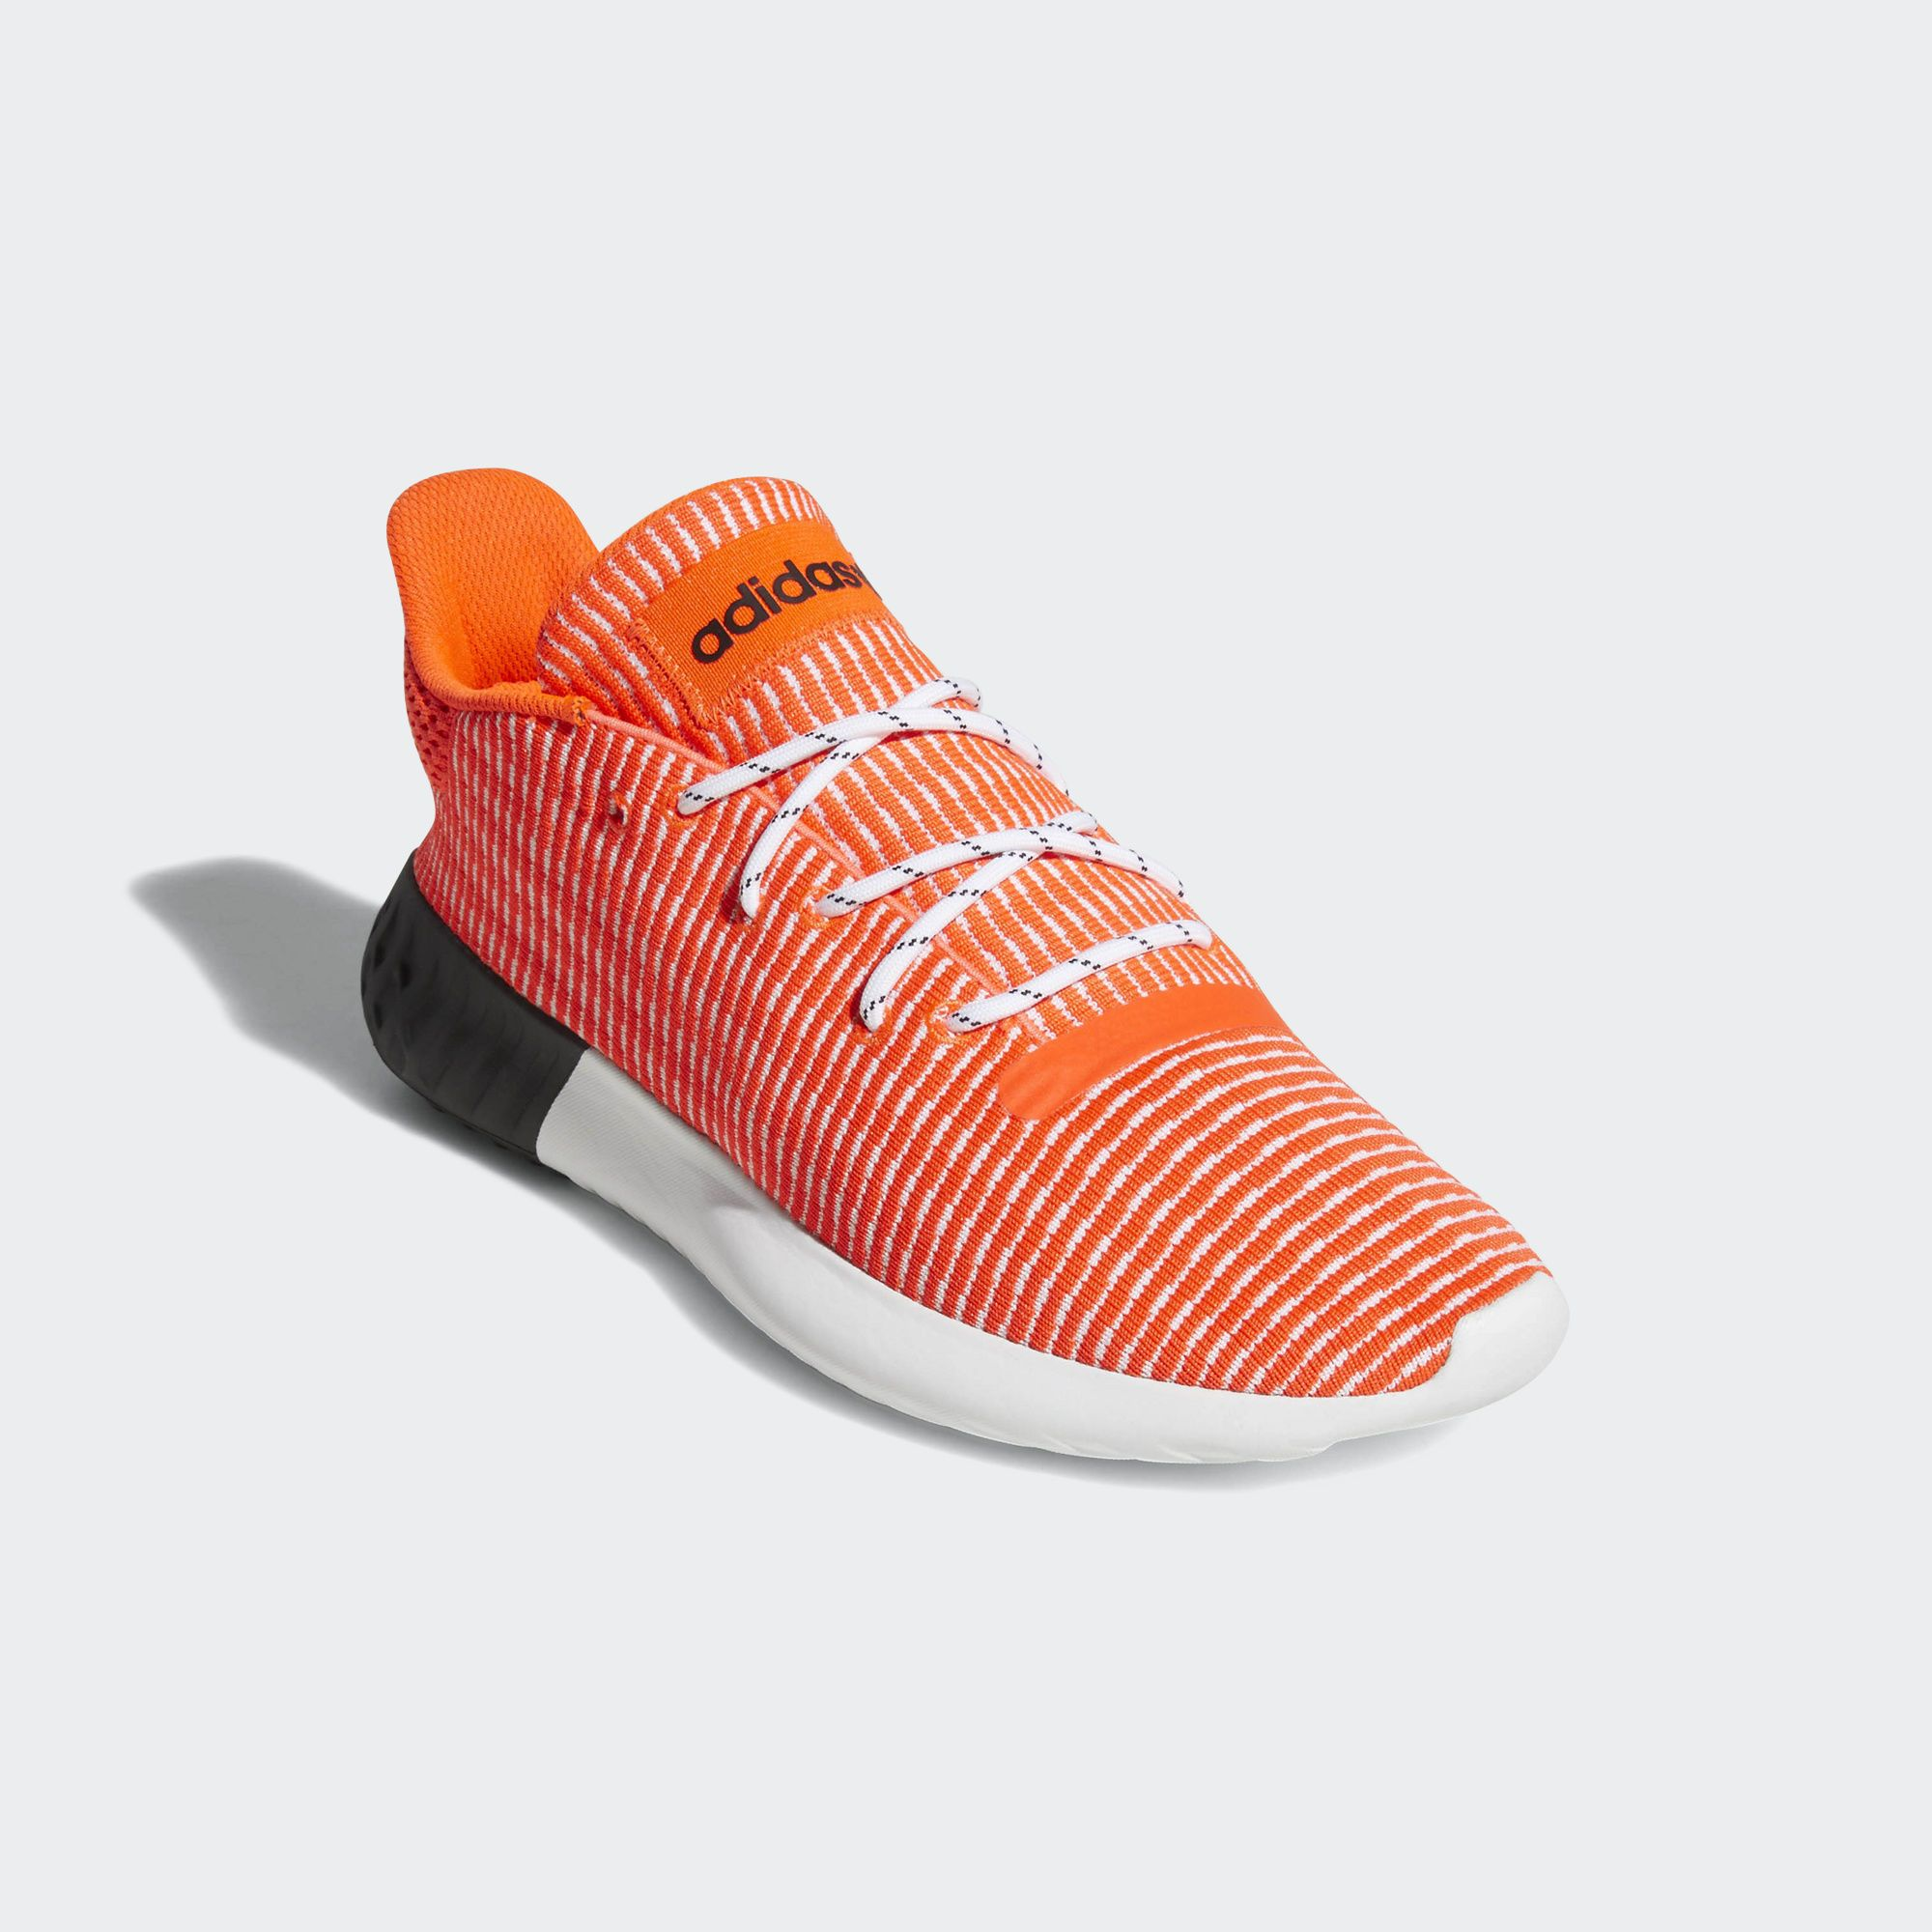 Details about adidas Tubular Dusk Primeknit Shoes Men s in 2019 ... 5a6144a27